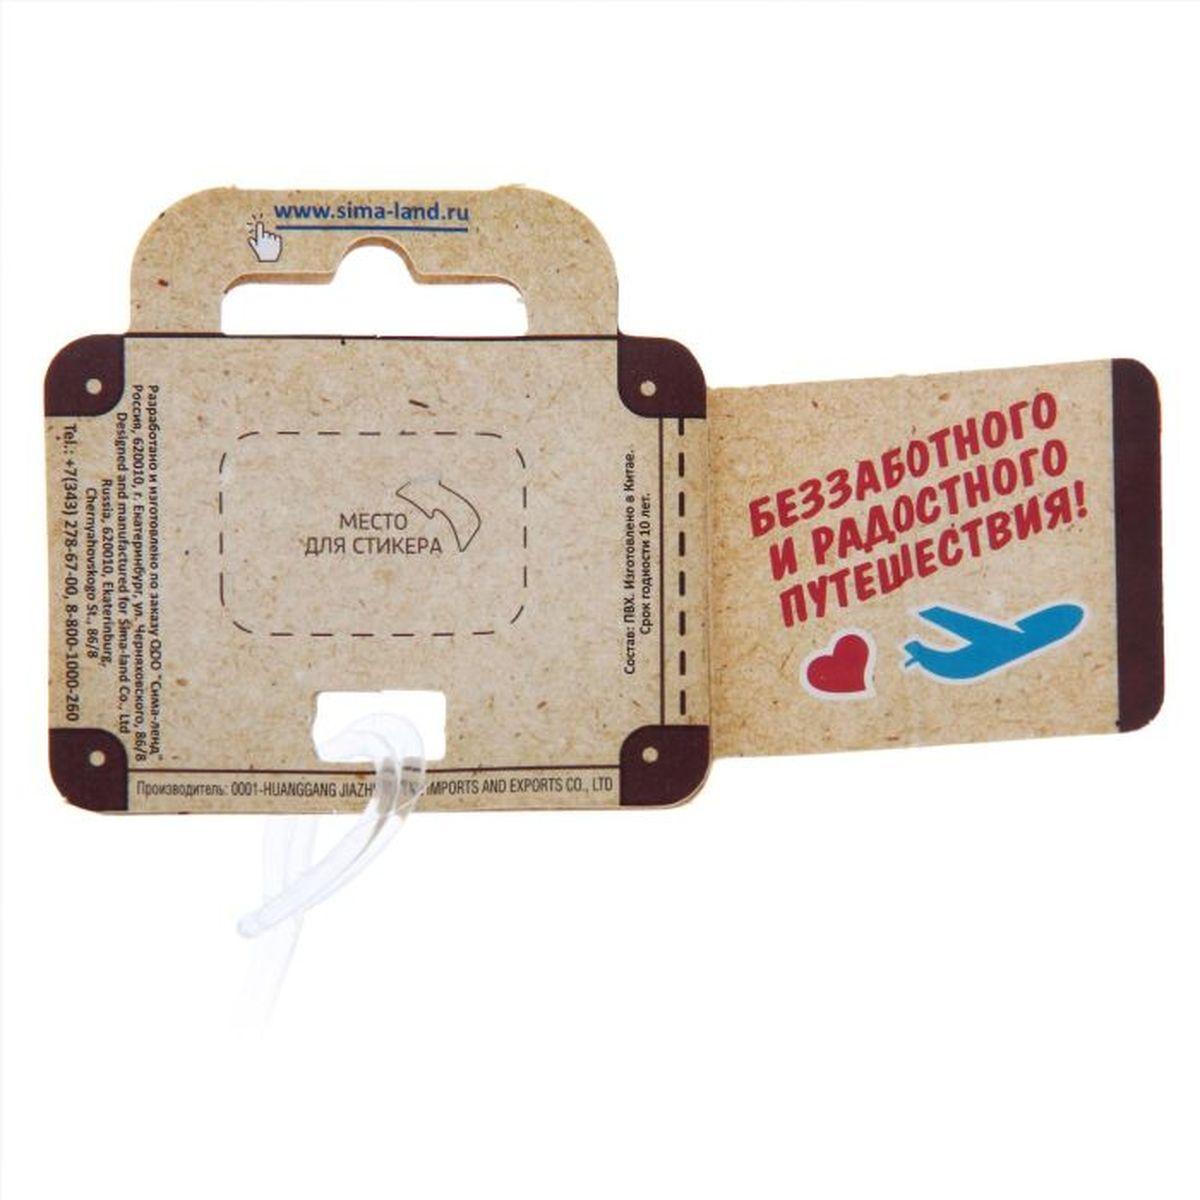 "Бирка на чемодан Sima-land ""Полон счастья и любви"", 7,5 х 10 см. 1144503"